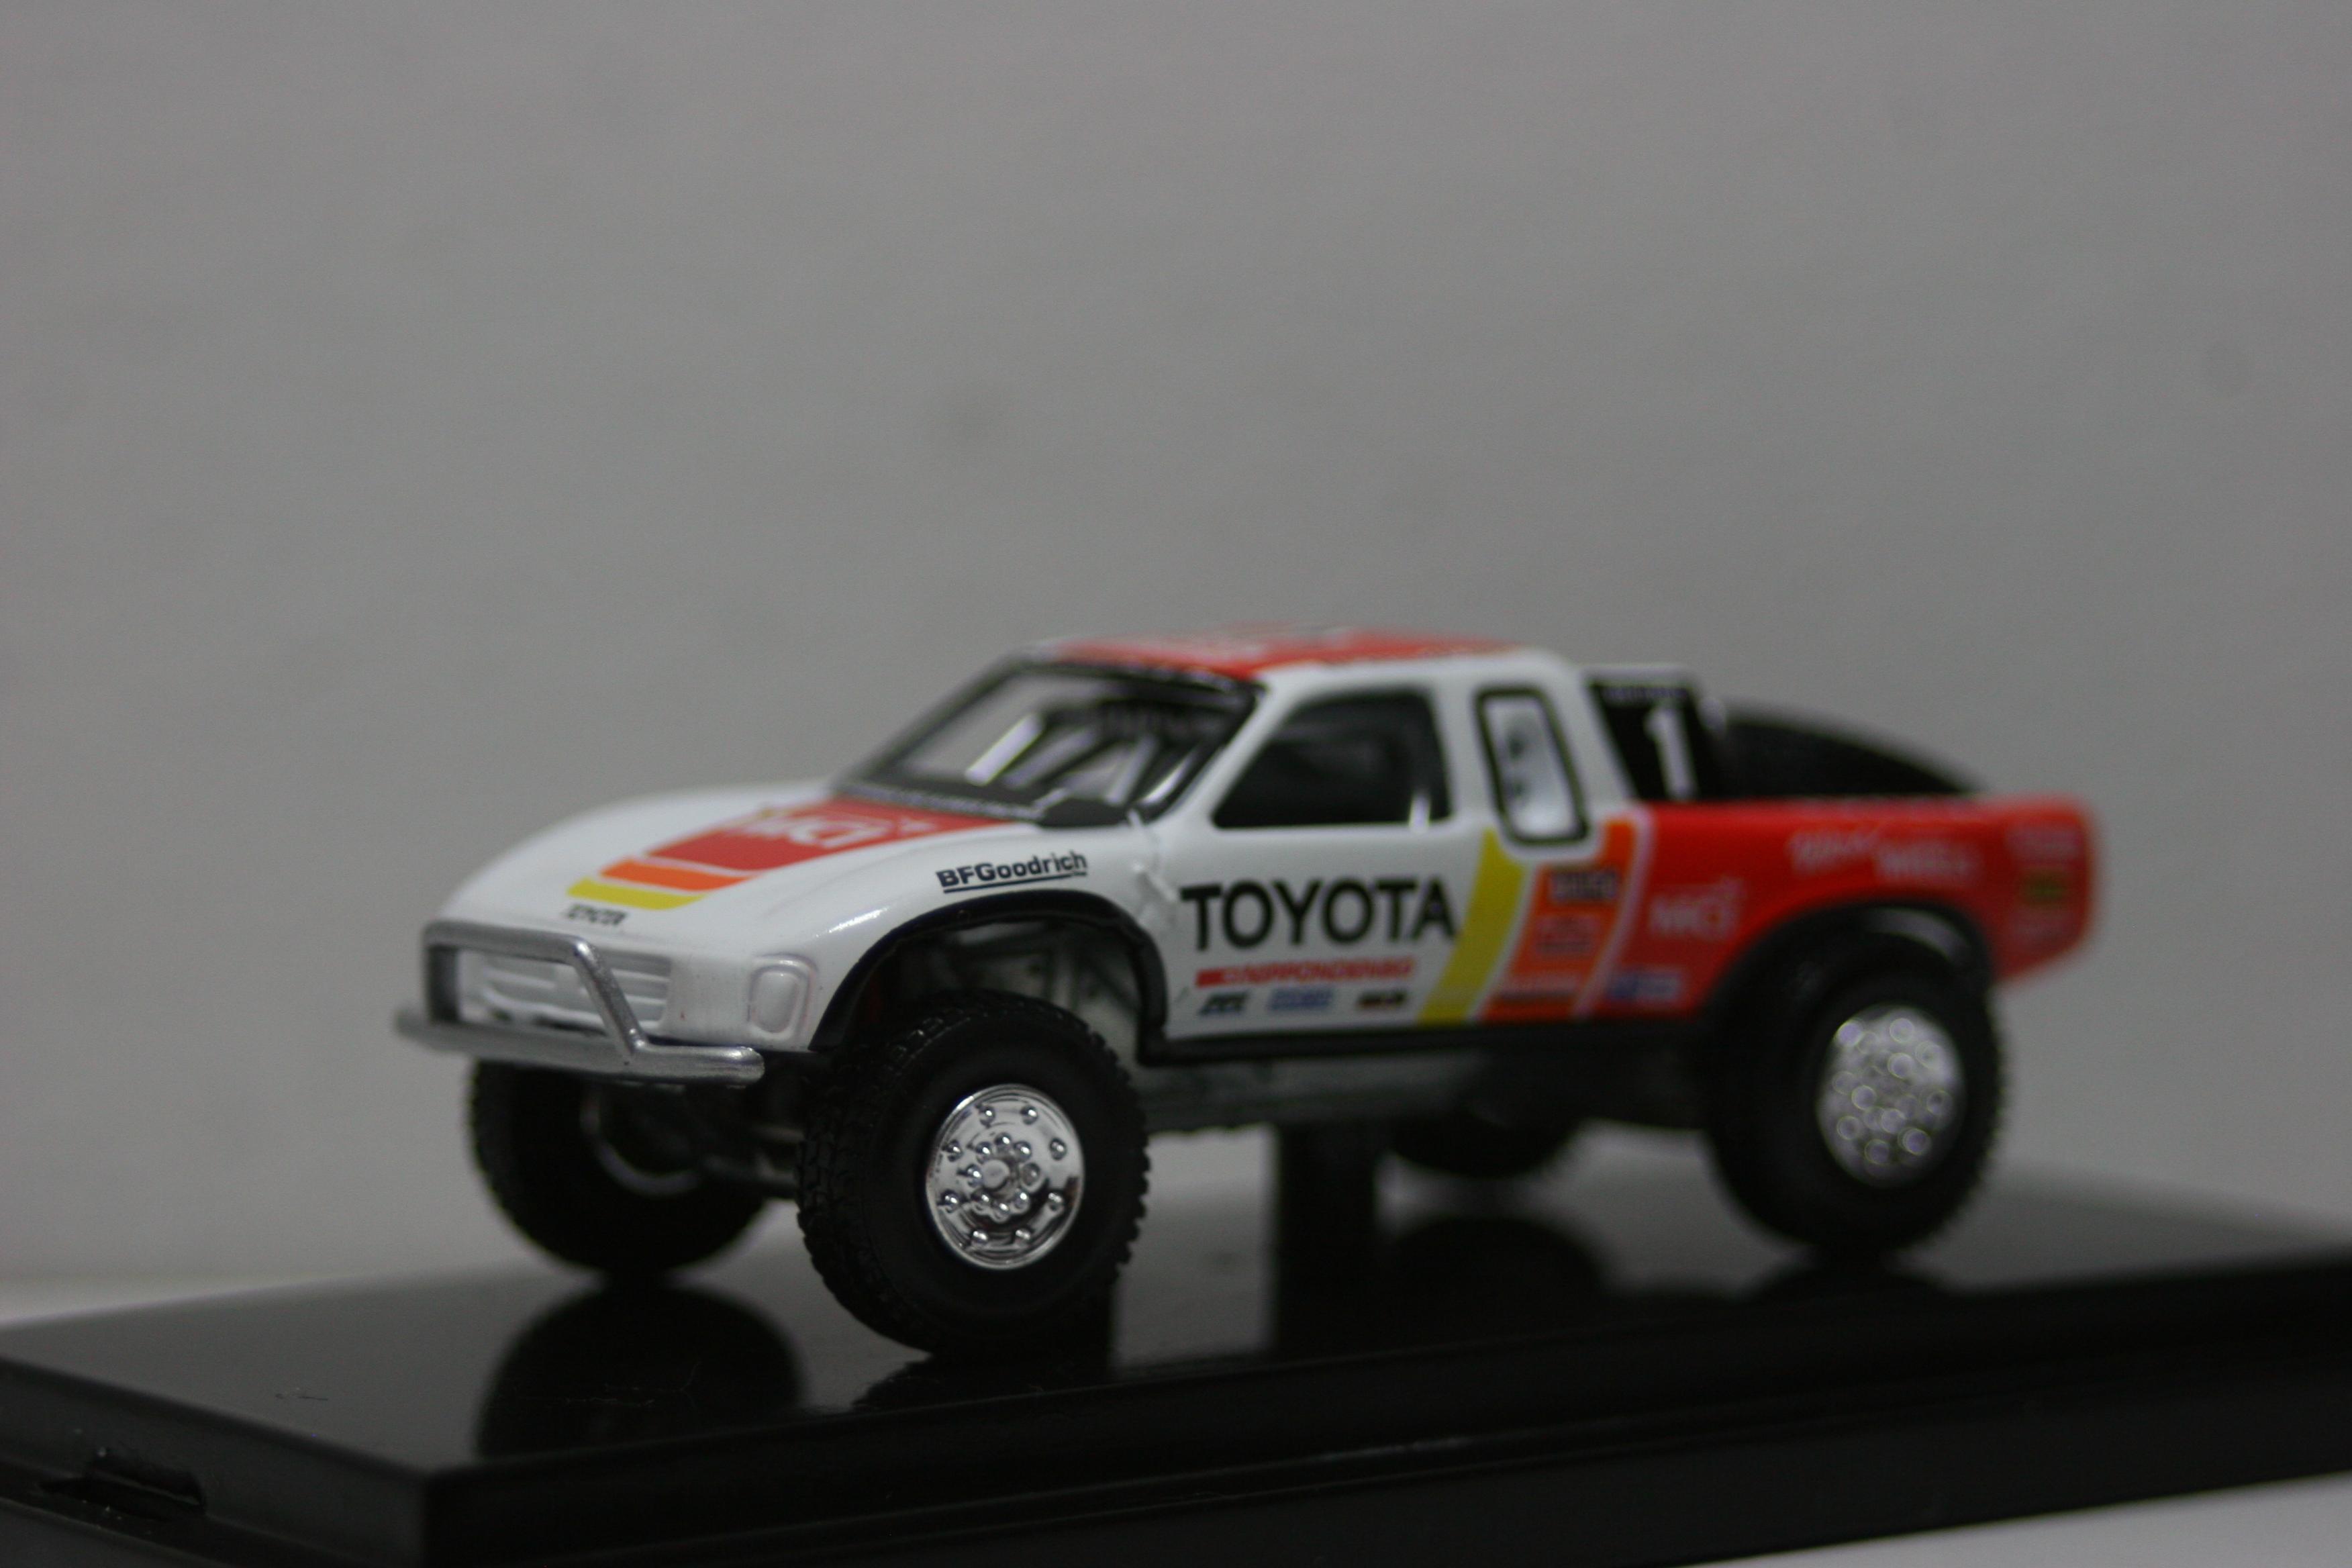 Toyota Baja Truck